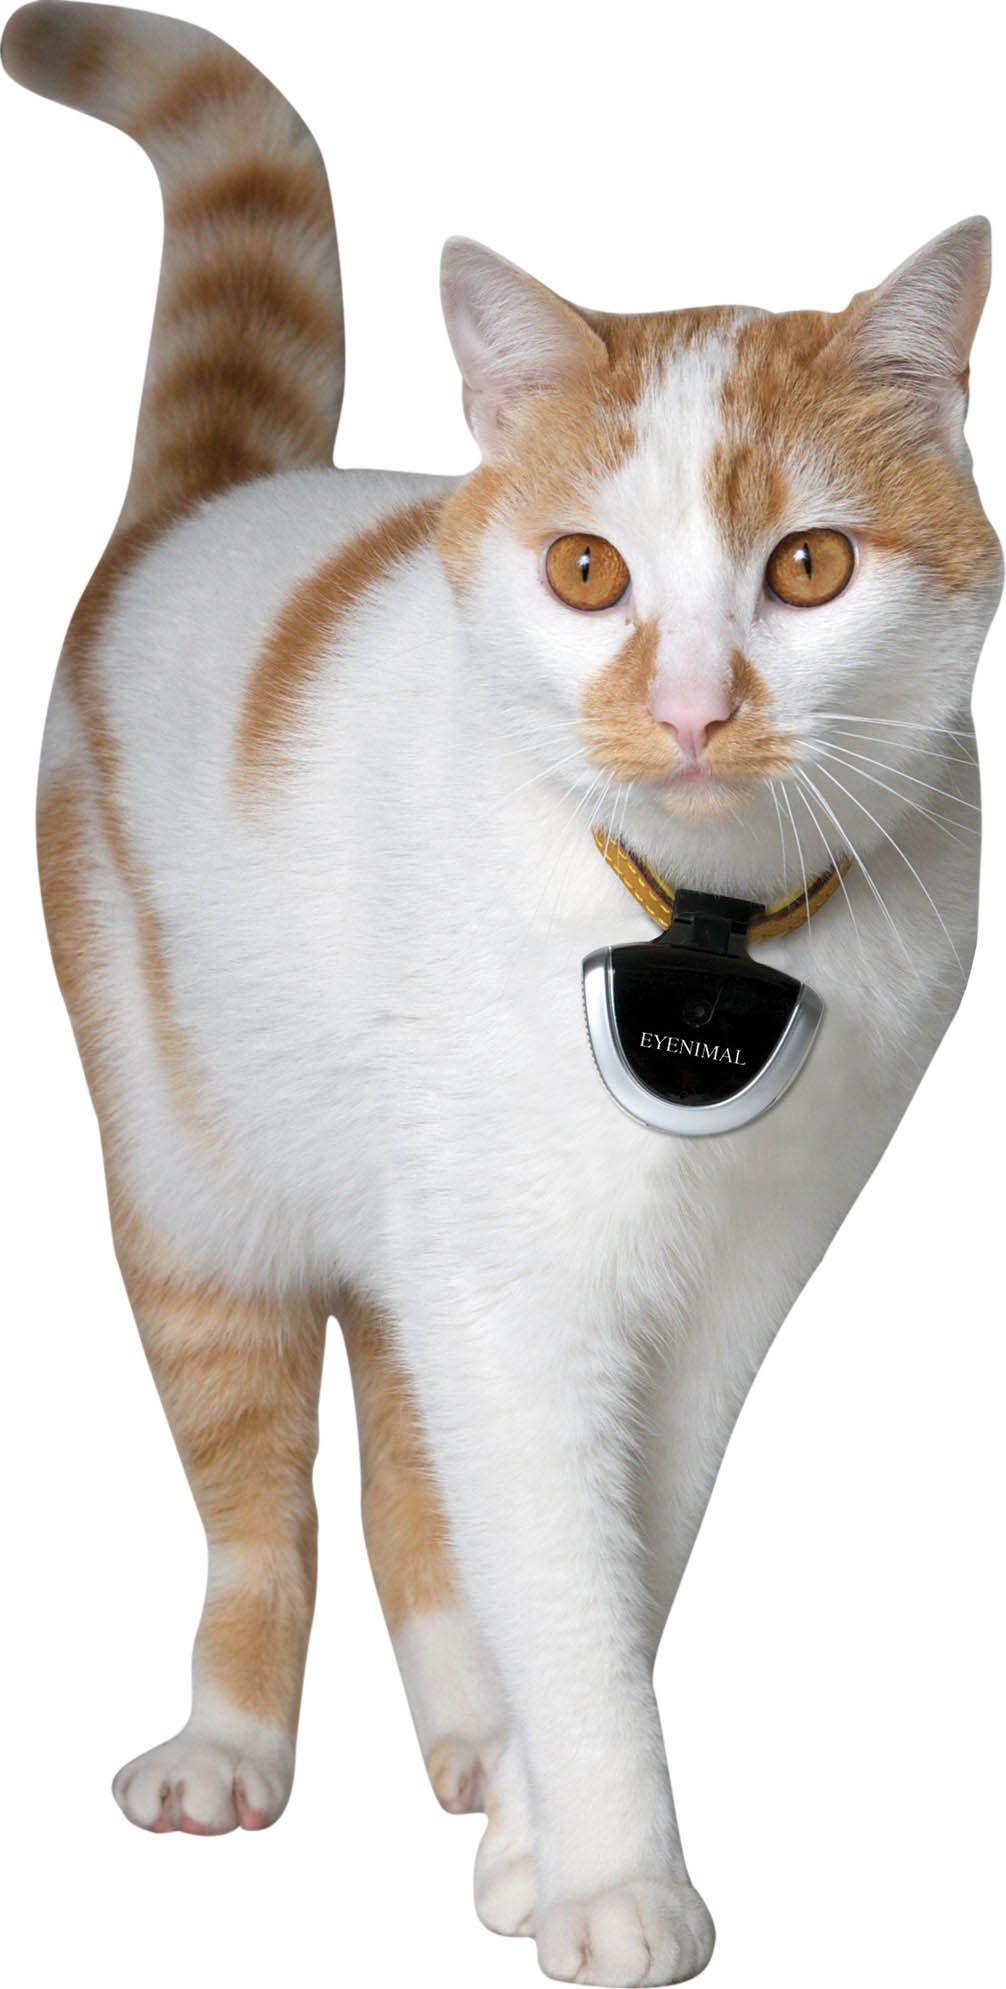 EYENIMAL Pet Video Camera » Pet Camera DOGTEK® (With